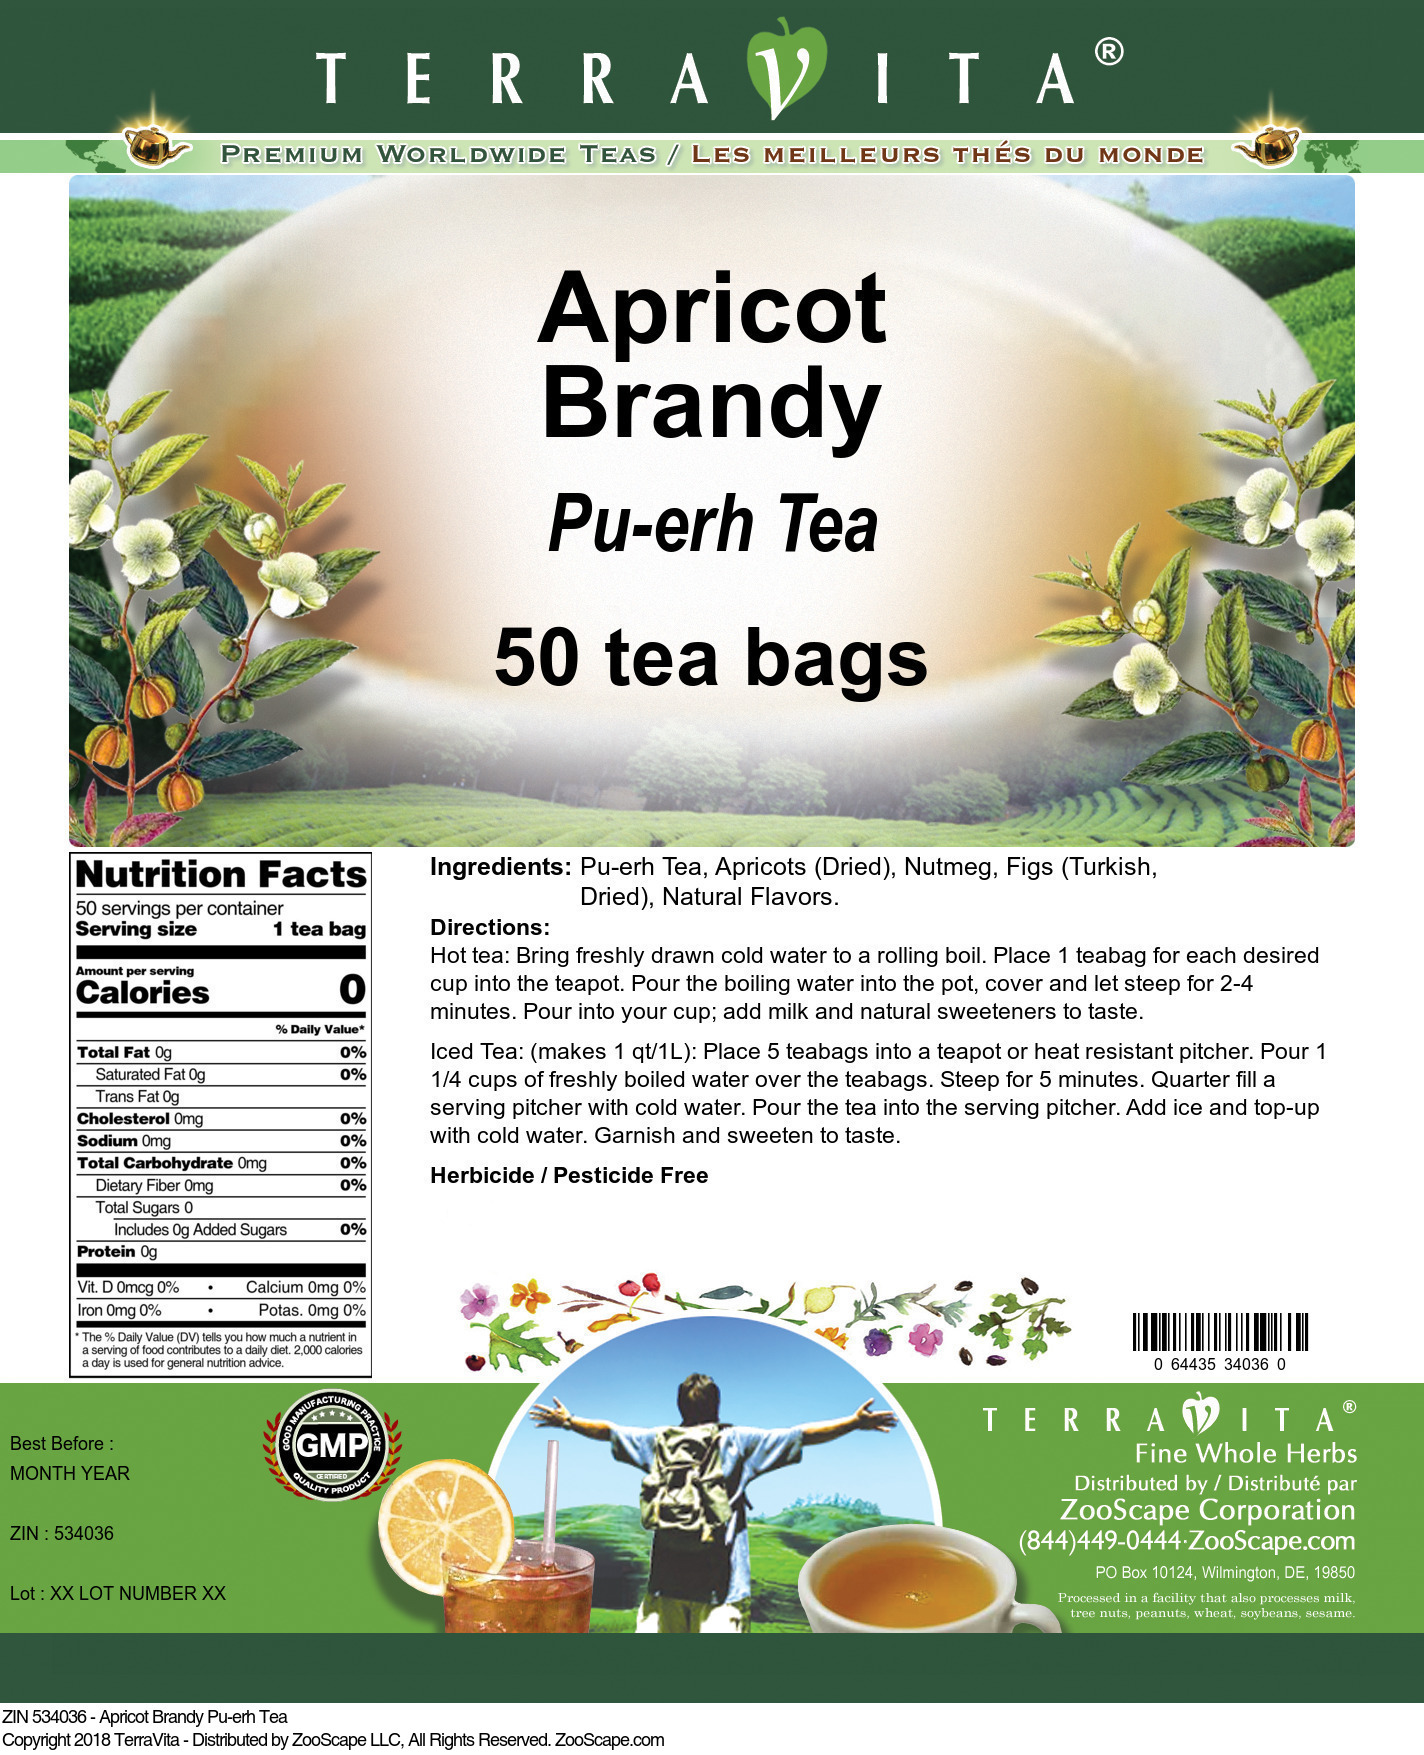 Apricot Brandy Pu-erh Tea